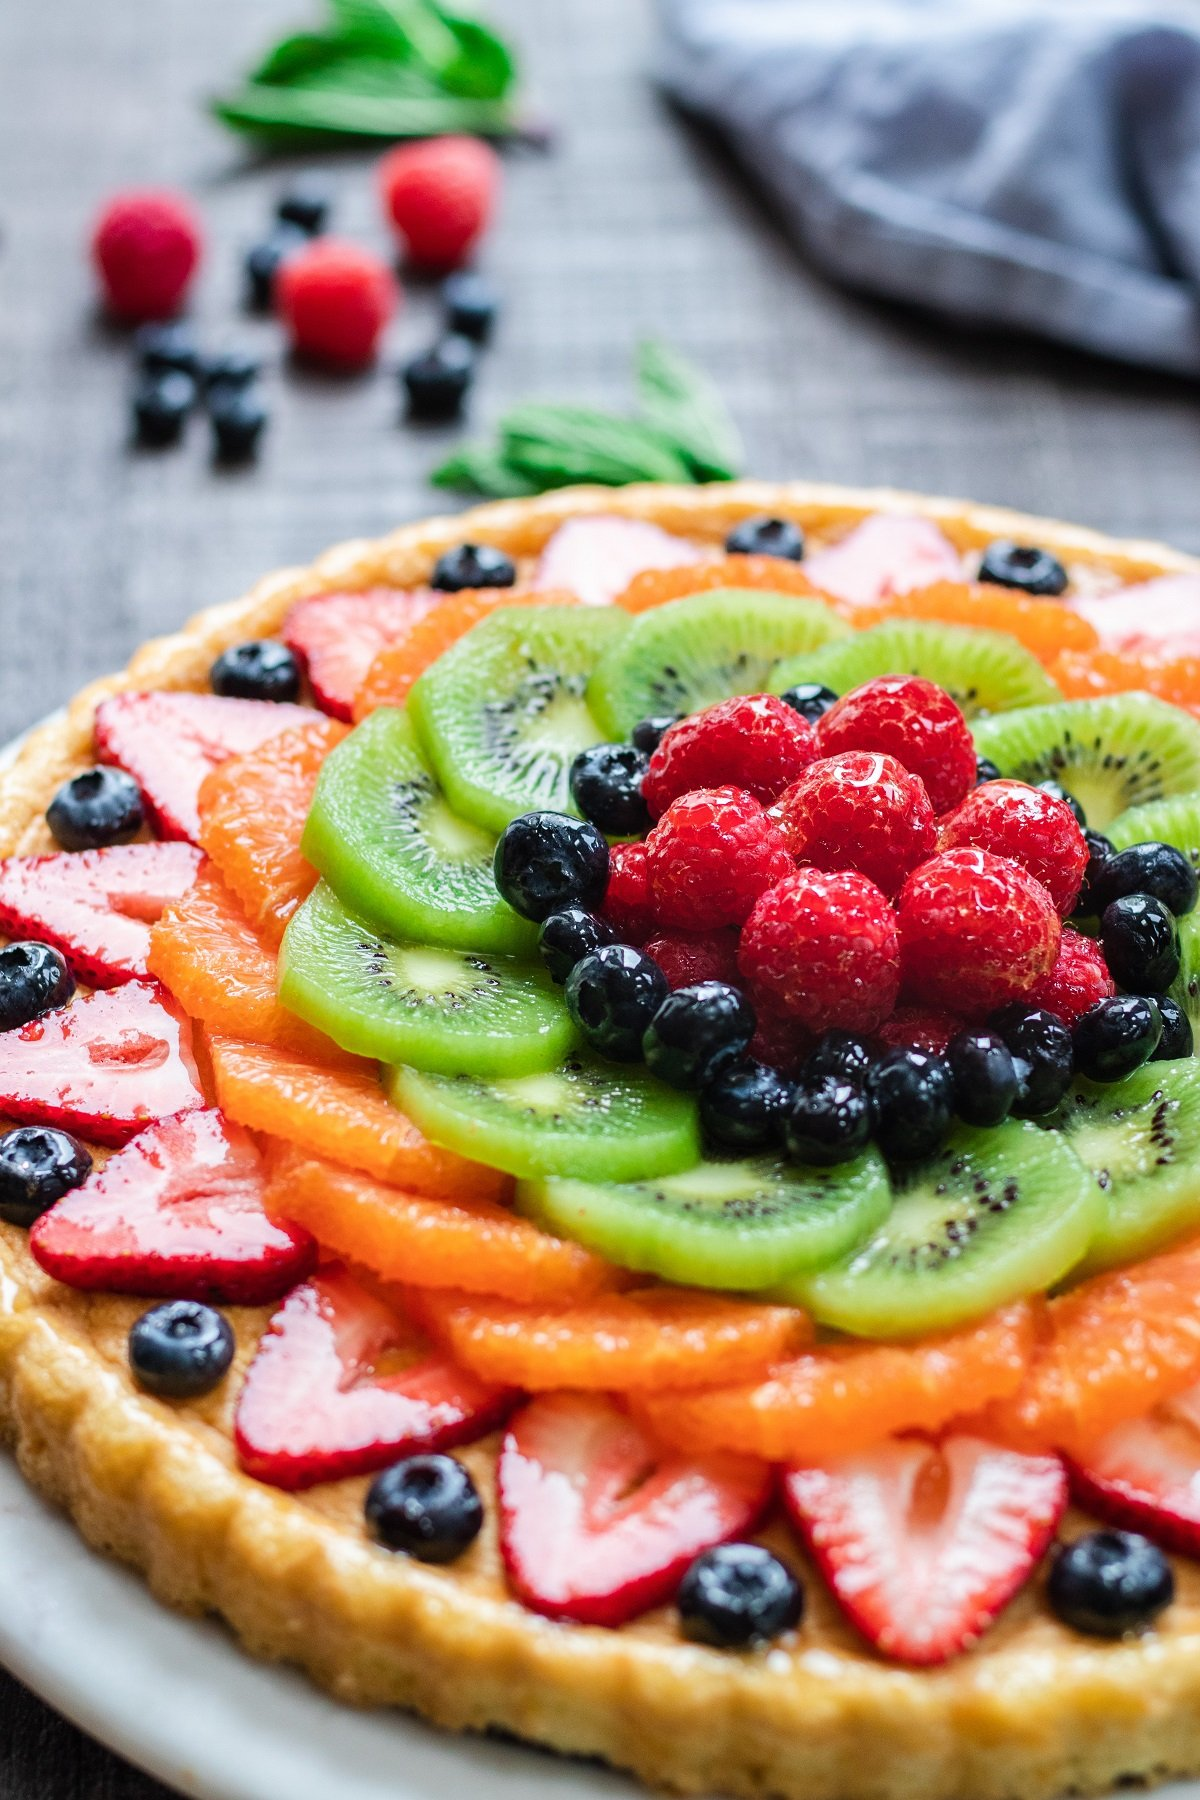 Glazed German Fresh Fruit Flan – a classic, delicious recipe showcasing beautiful fruit on light, lemon-scented sponge cake! giveitsomethyme.com